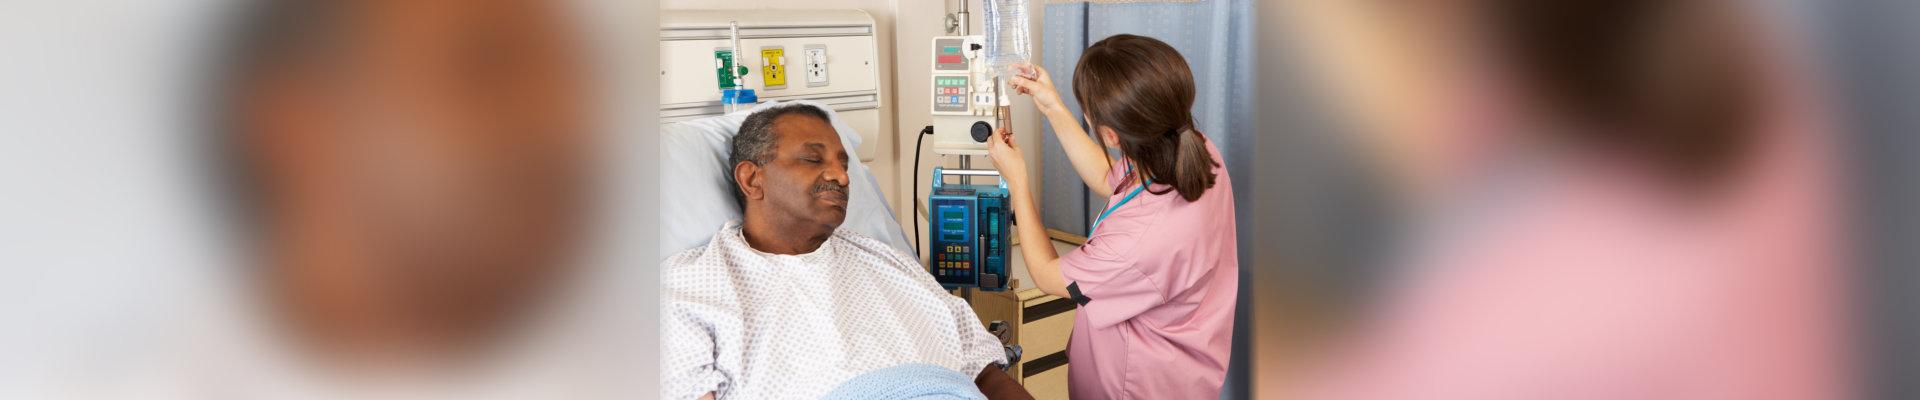 nurse checking on an old man's iv drip